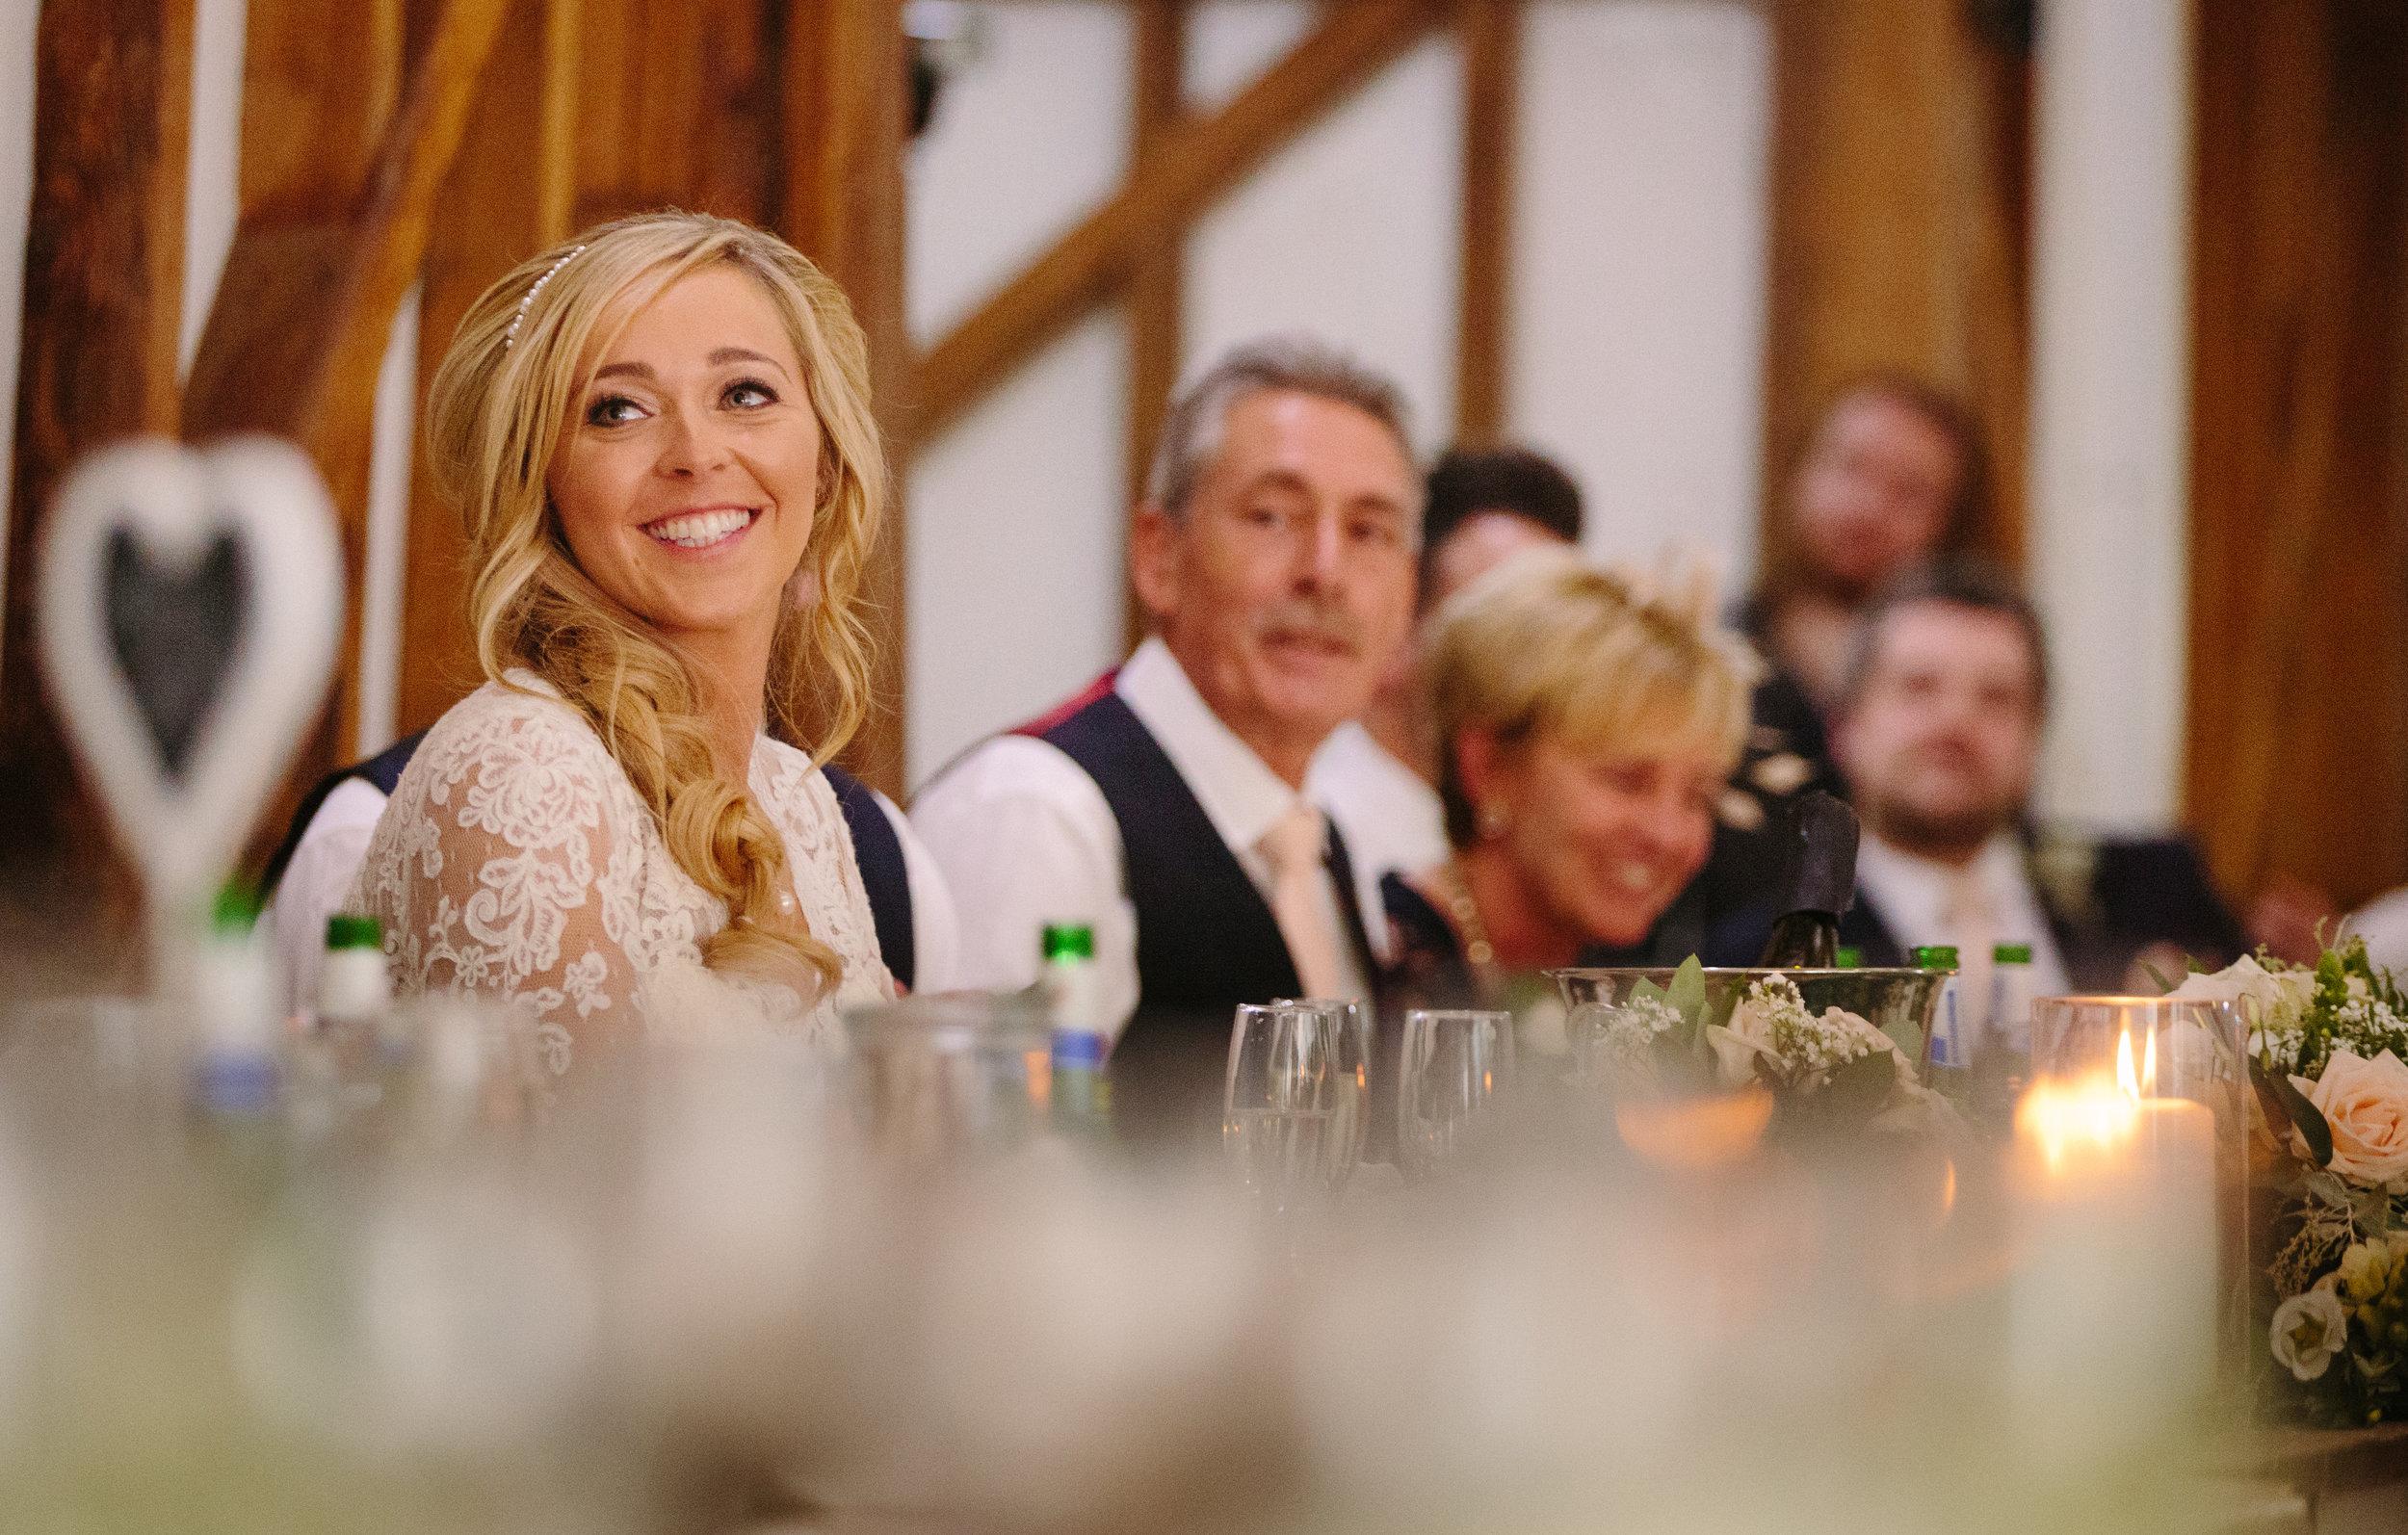 london-hertfordshire-wedding-photography-milling-barn-speeches-70